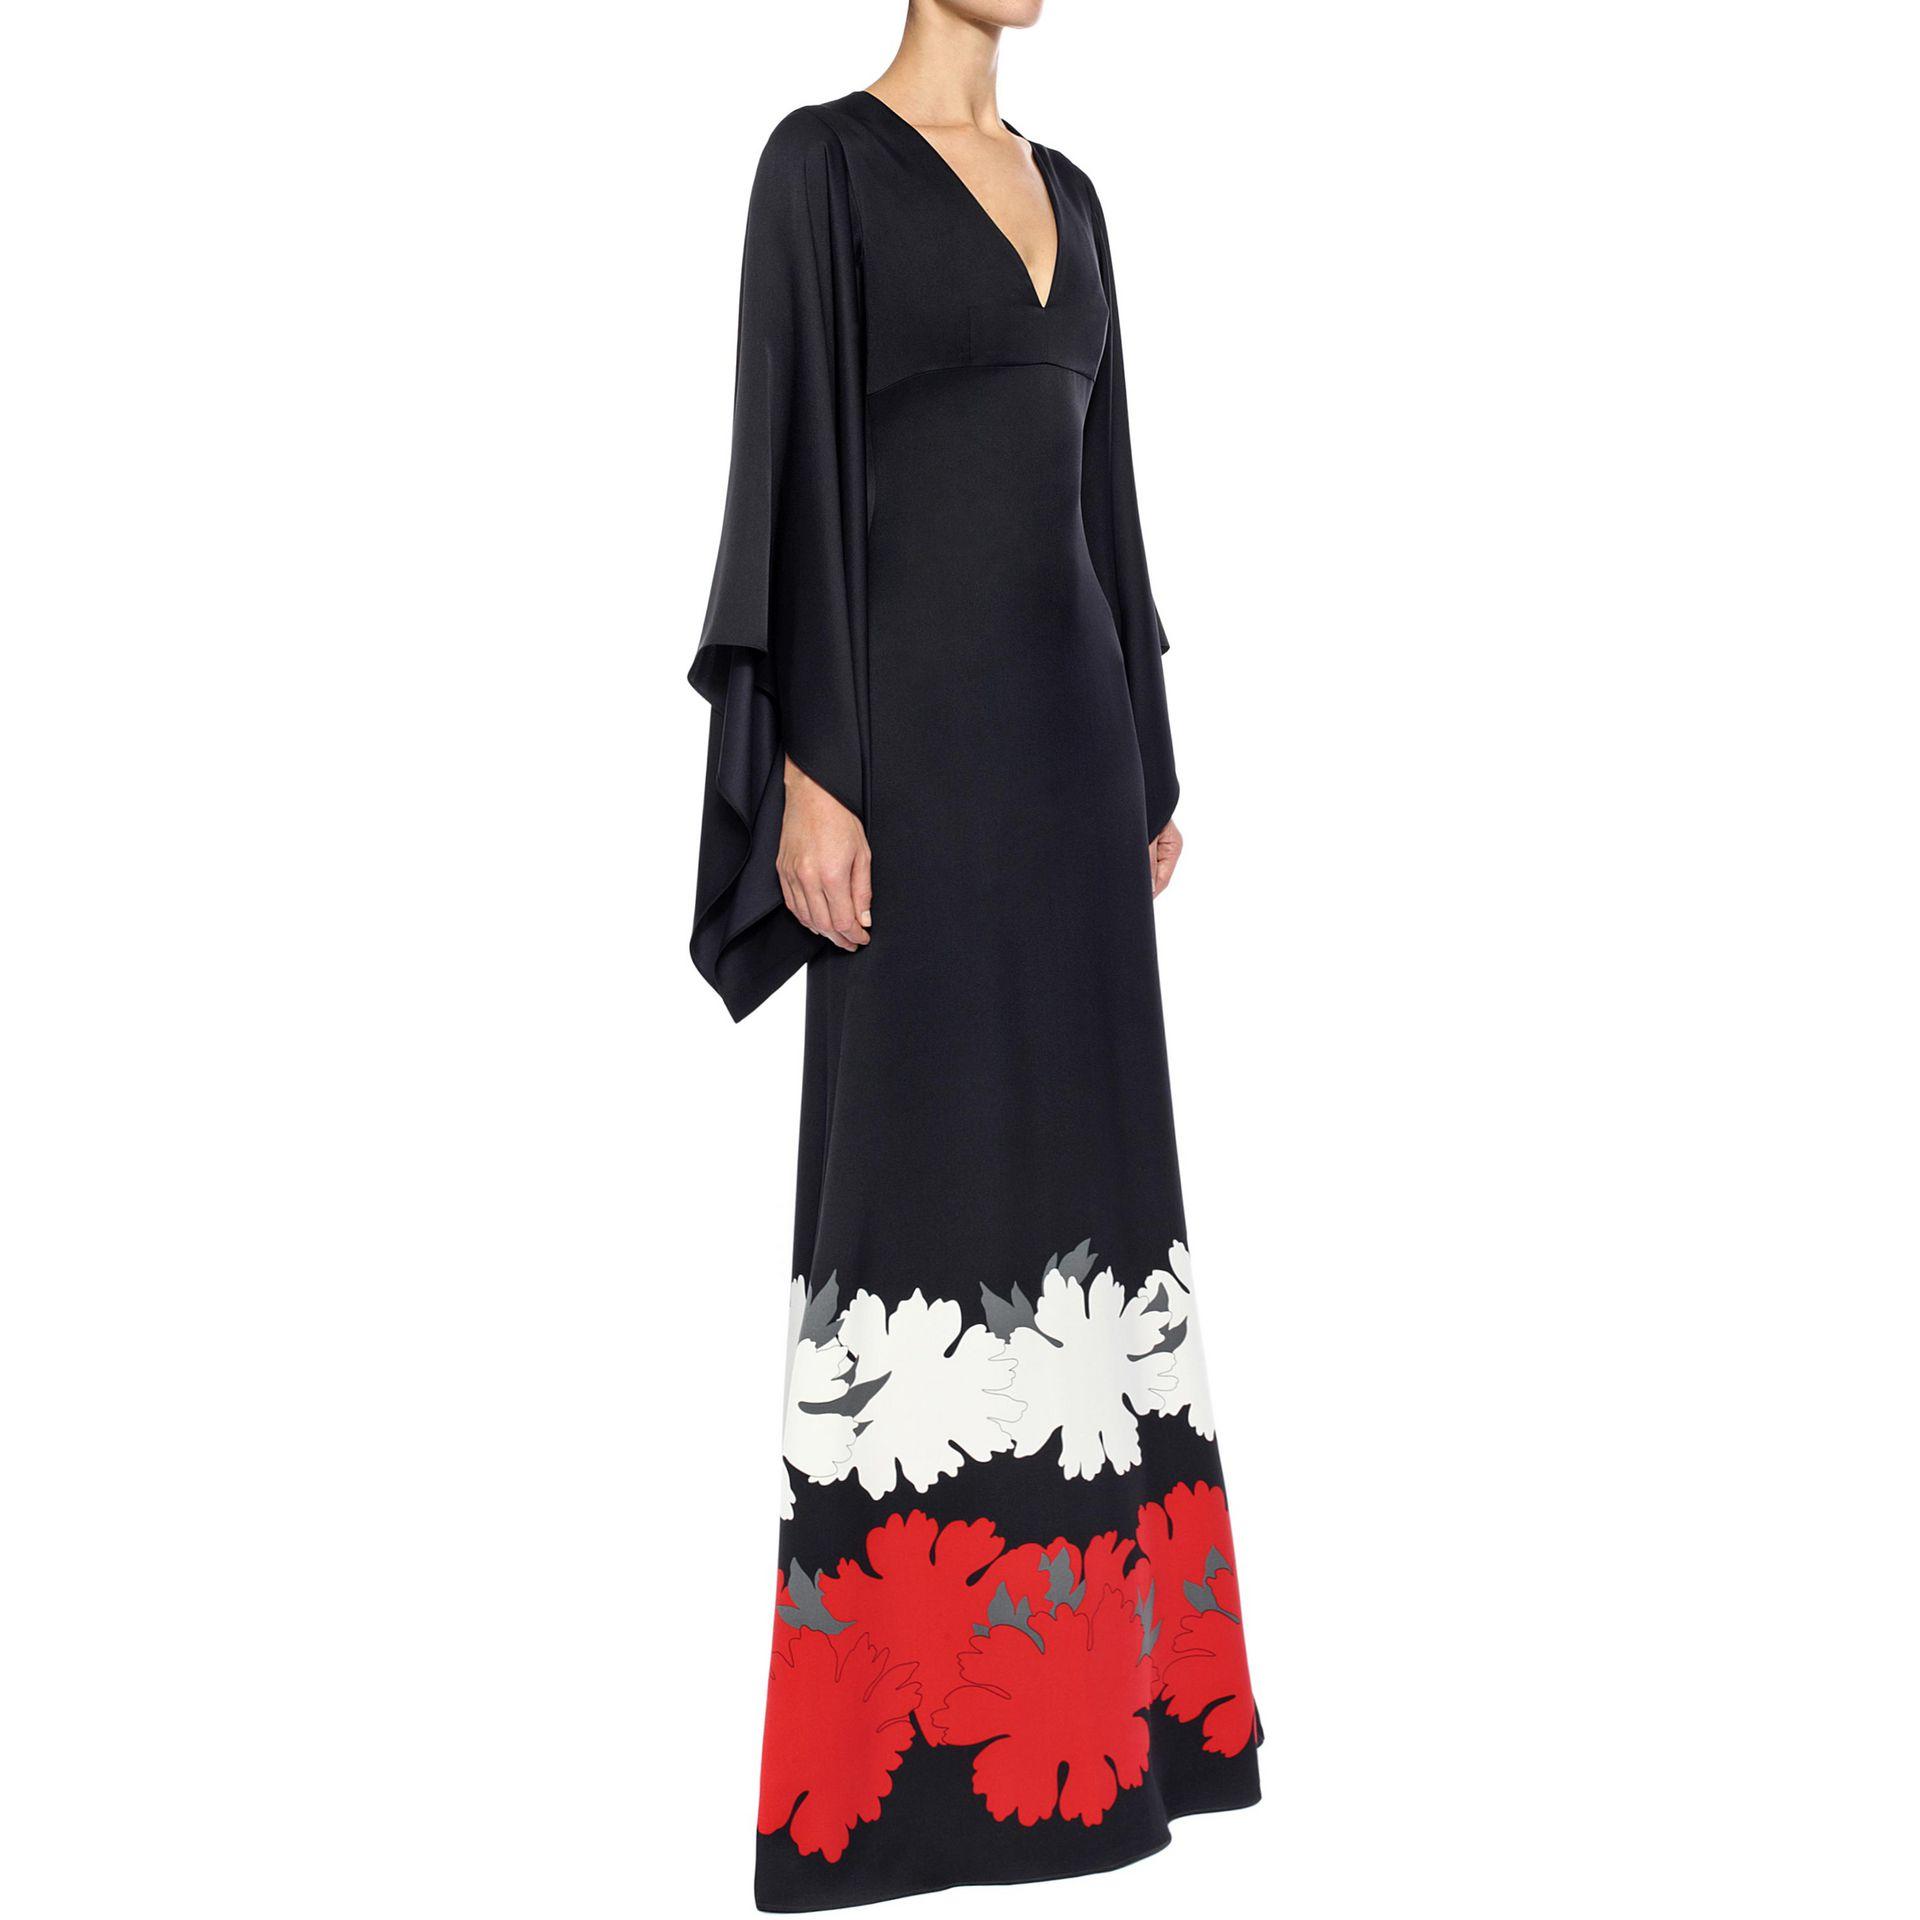 ae413ad96d1b Alexander McQueen Satin Kimono Sleeve Long Dress in Black - Lyst